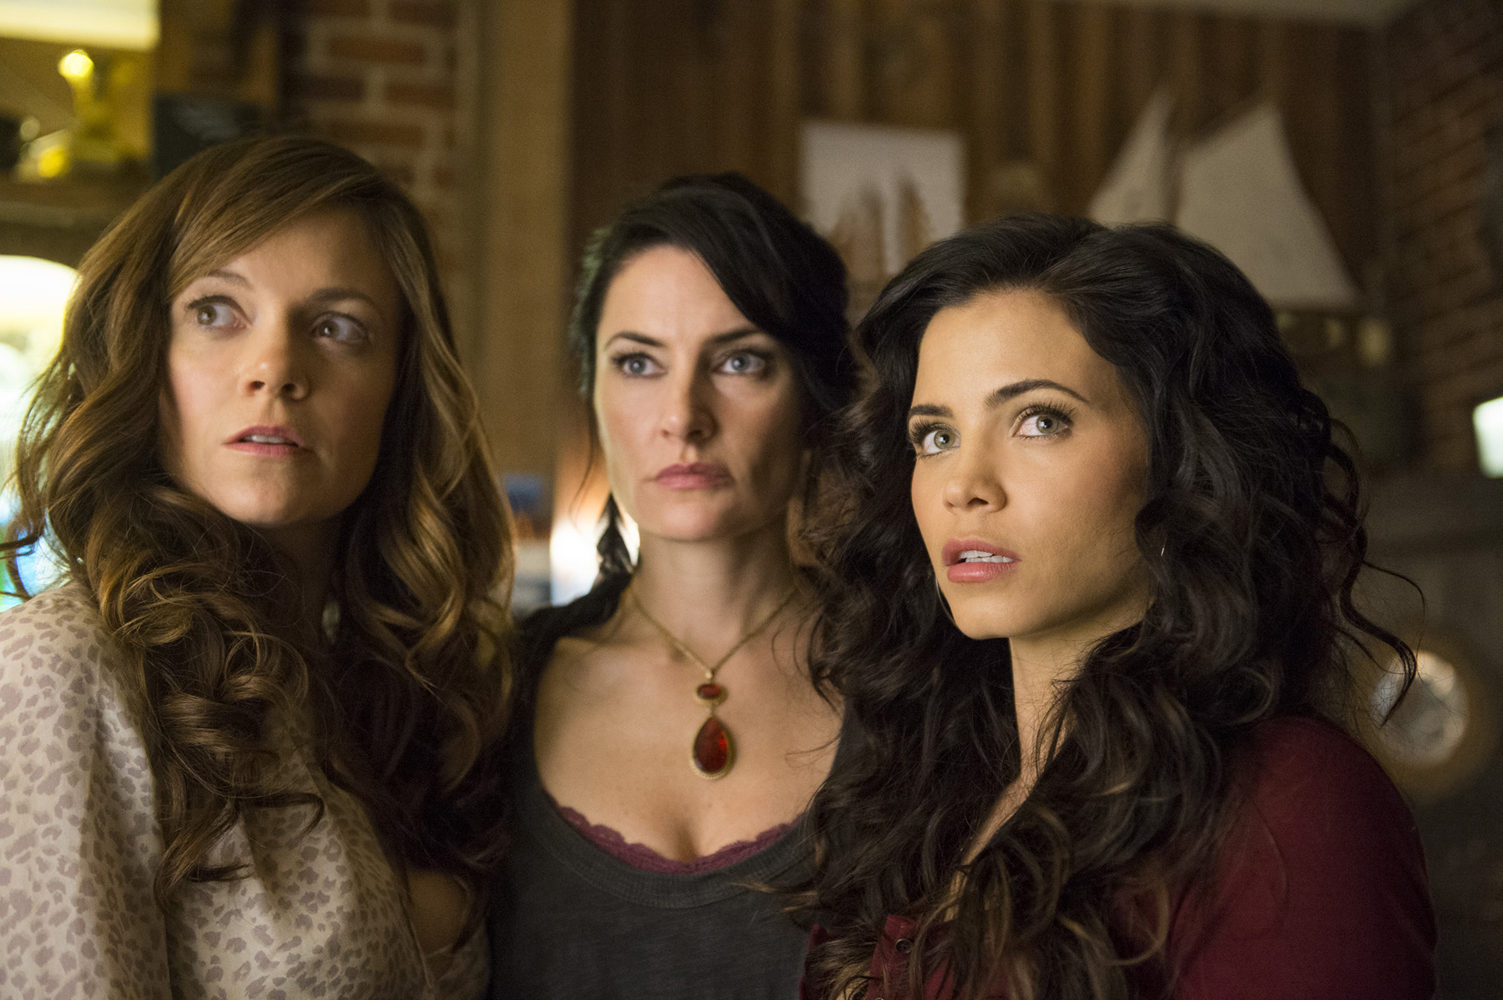 Jenna Dewan Tatum Witches of East End Season 2 Episode 1